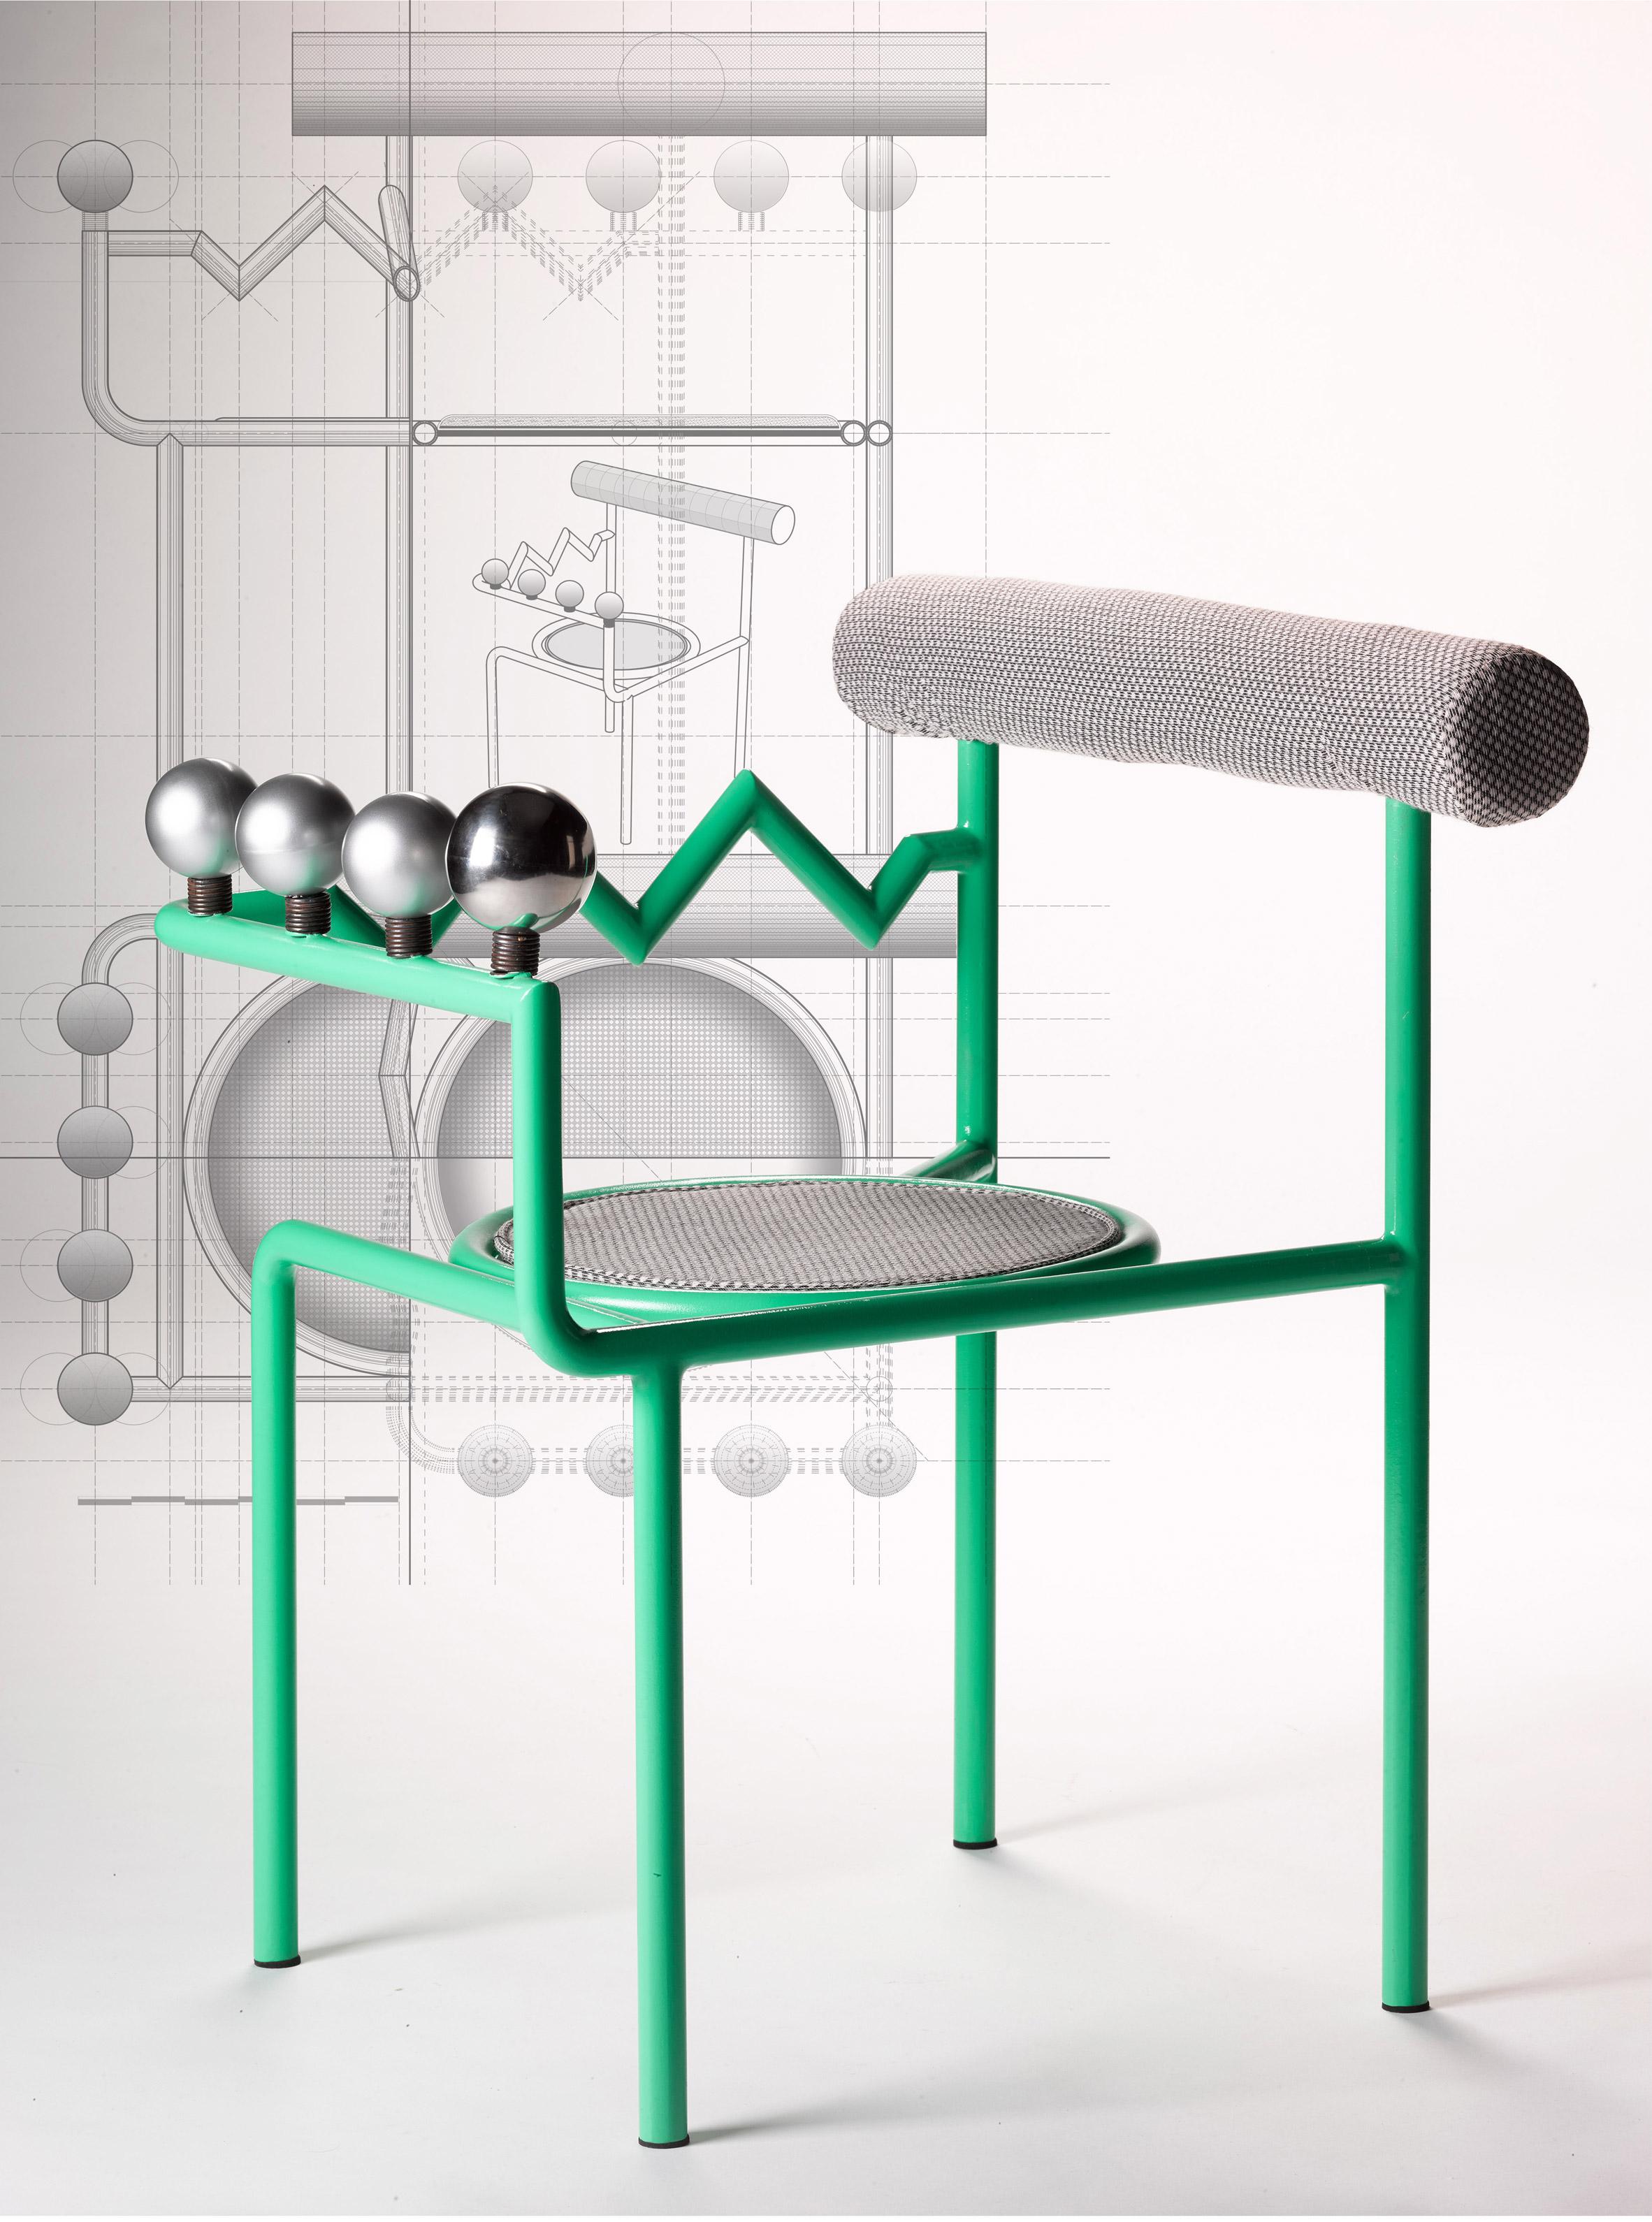 hu-yuming-chairs-behaviour-graduate-china-design_dezeen_2364_col_4